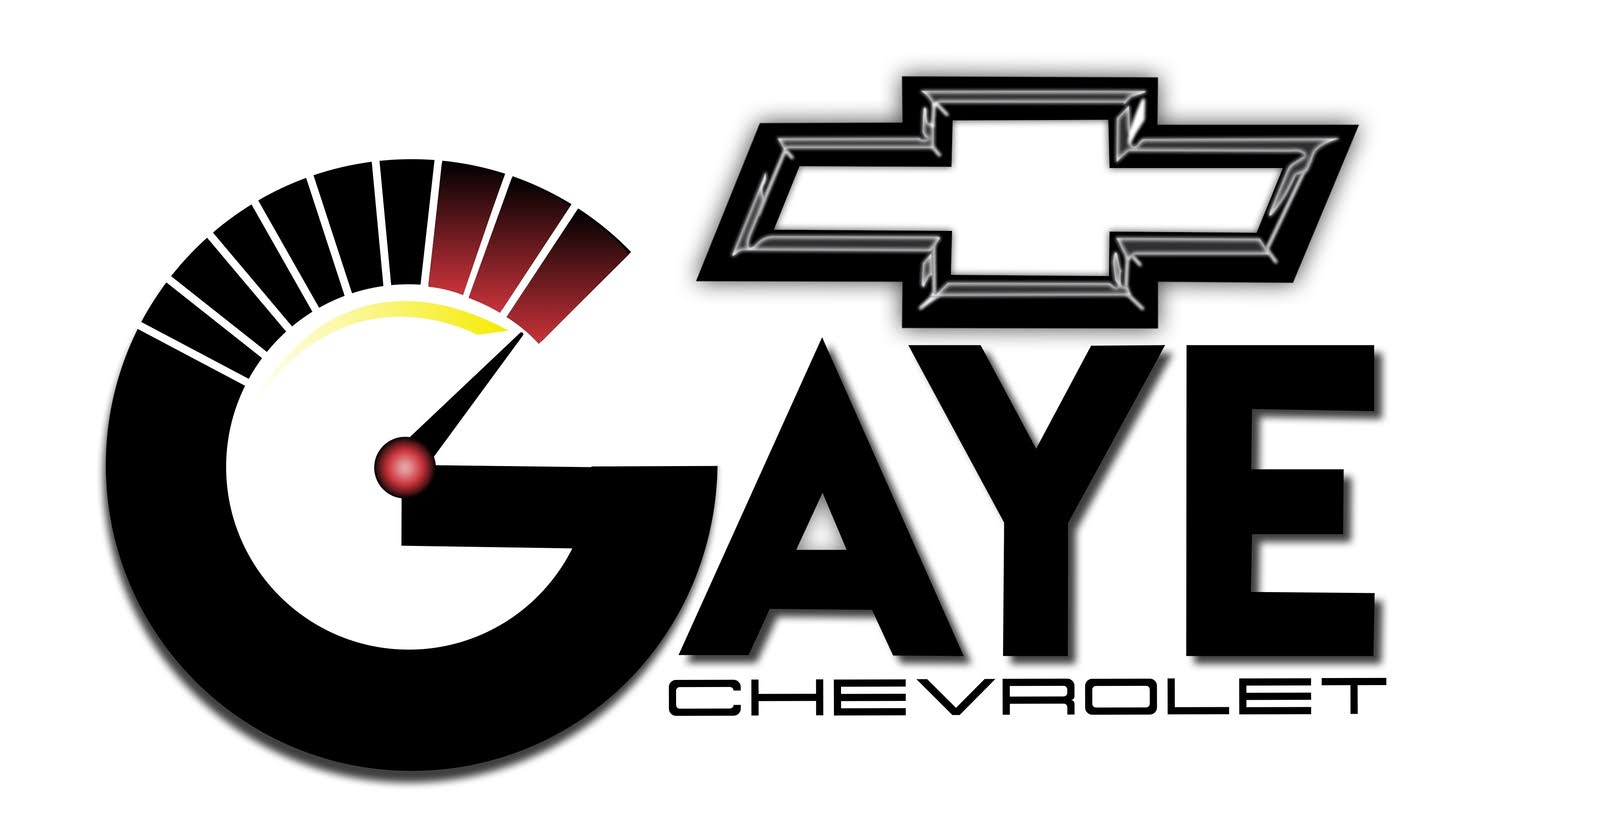 Gaye Chevrolet Marshville Nc Read Consumer Reviews